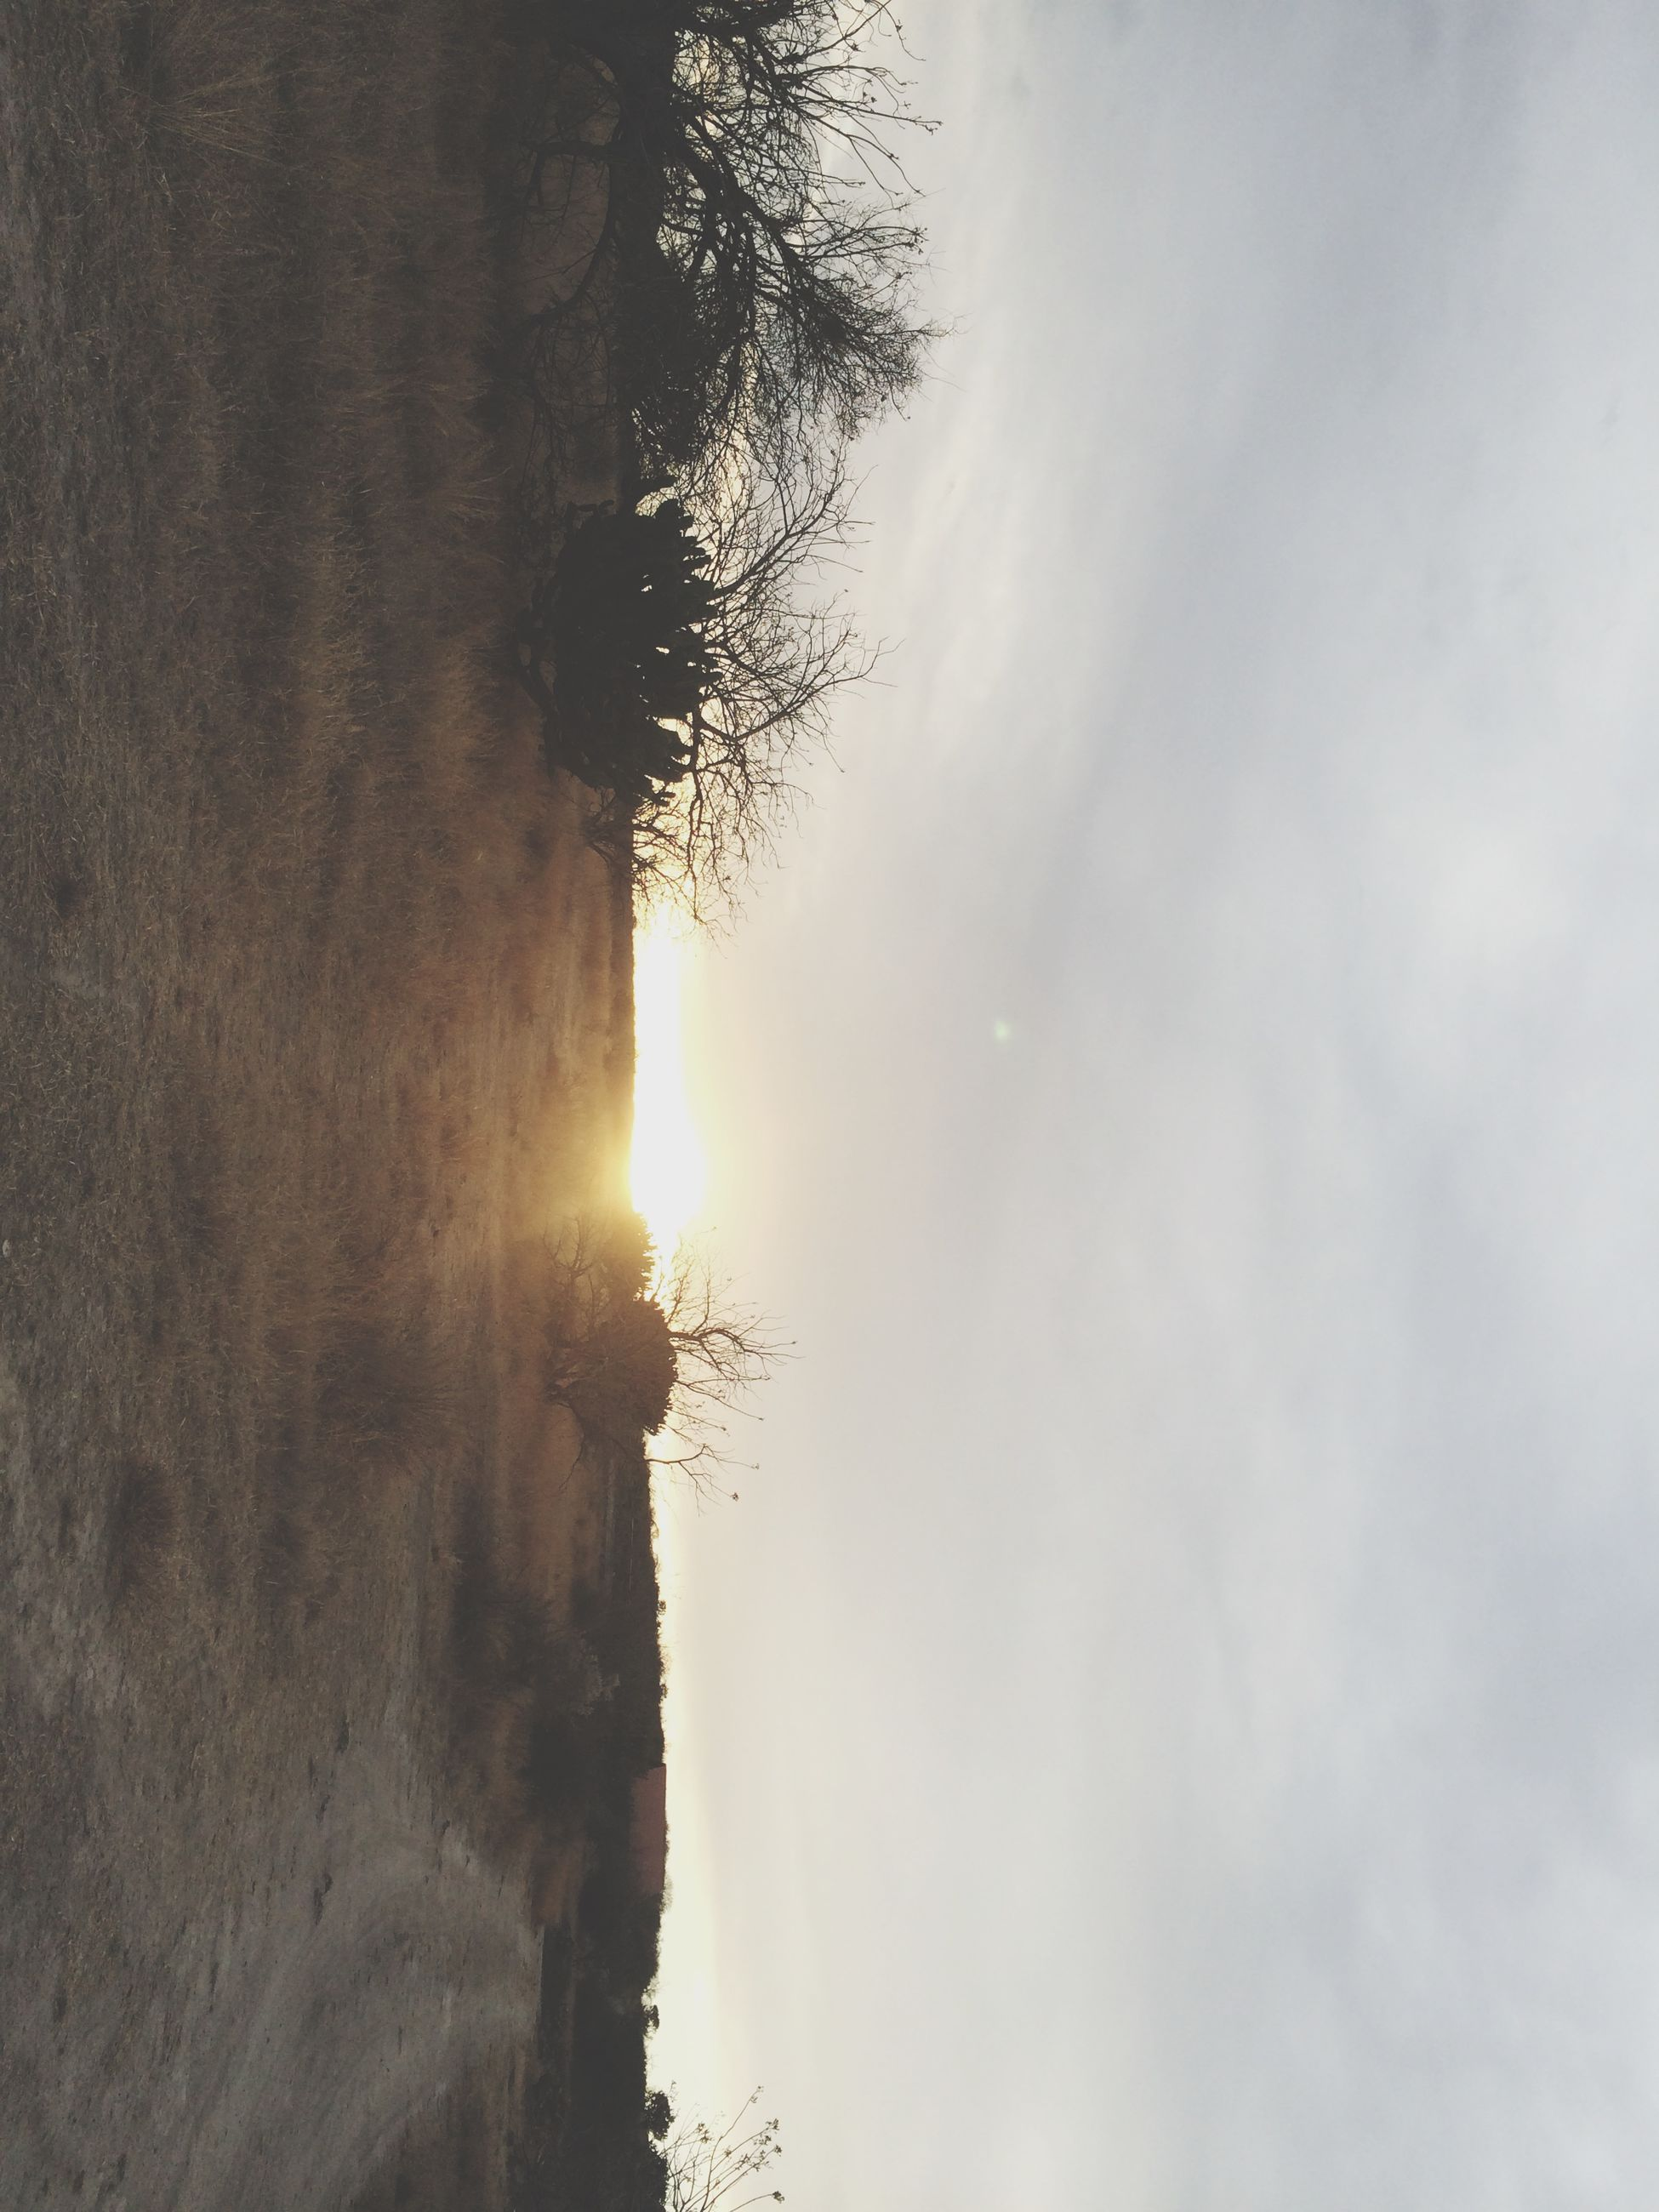 sun, tranquility, sky, tranquil scene, scenics, sunset, beauty in nature, sunlight, tree, nature, sunbeam, landscape, cloud - sky, silhouette, idyllic, lens flare, non-urban scene, outdoors, no people, field